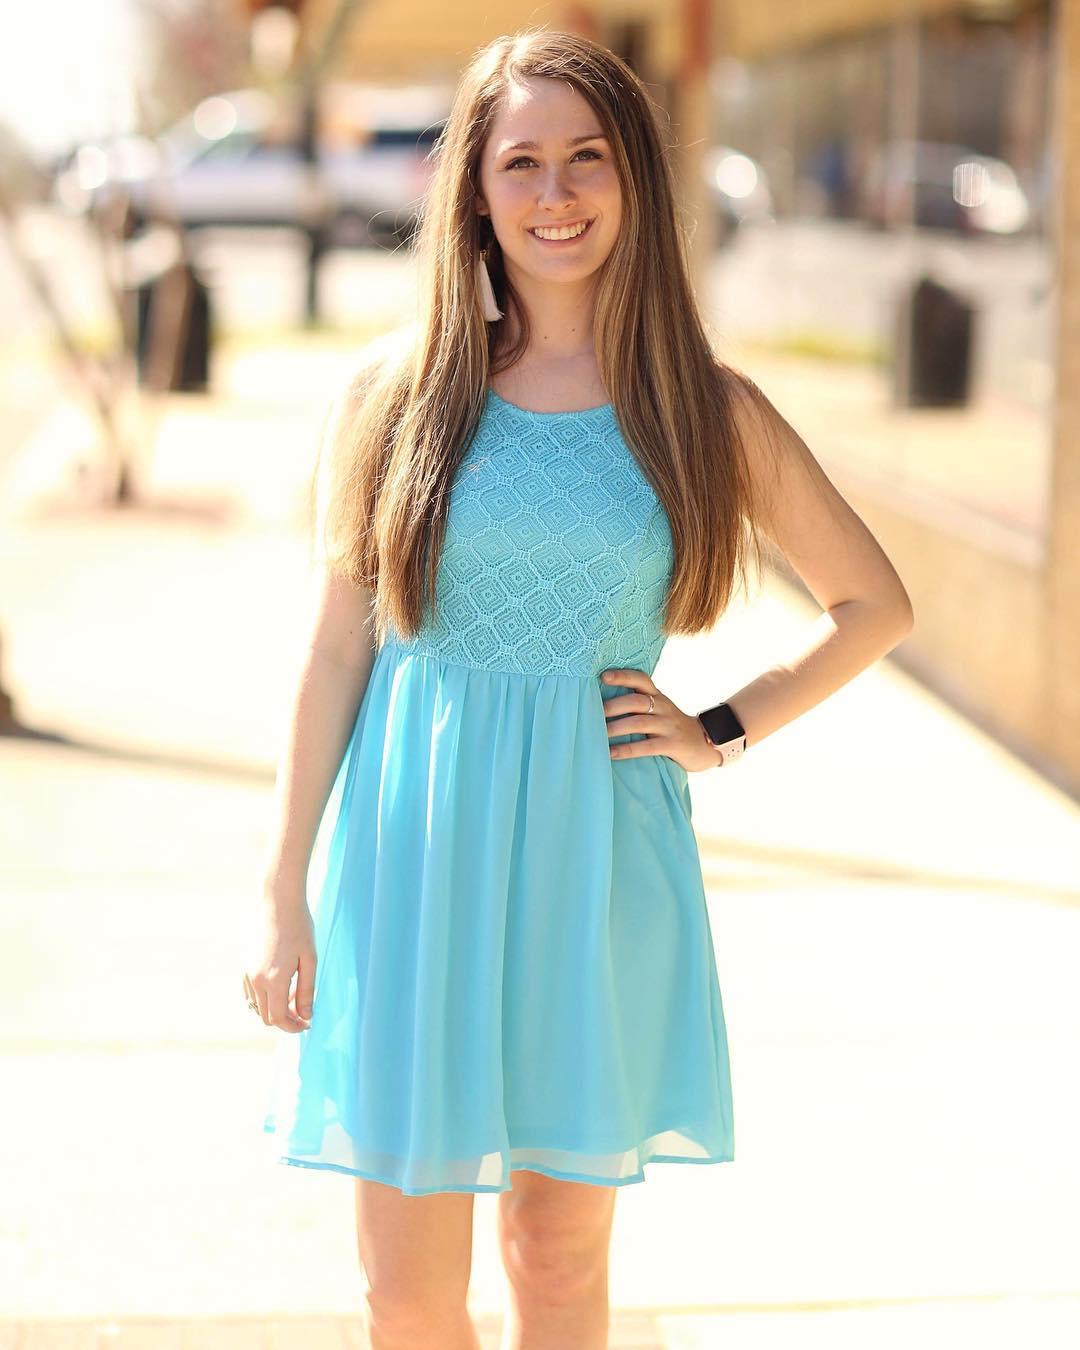 Turquoise dress for wedding invitation.